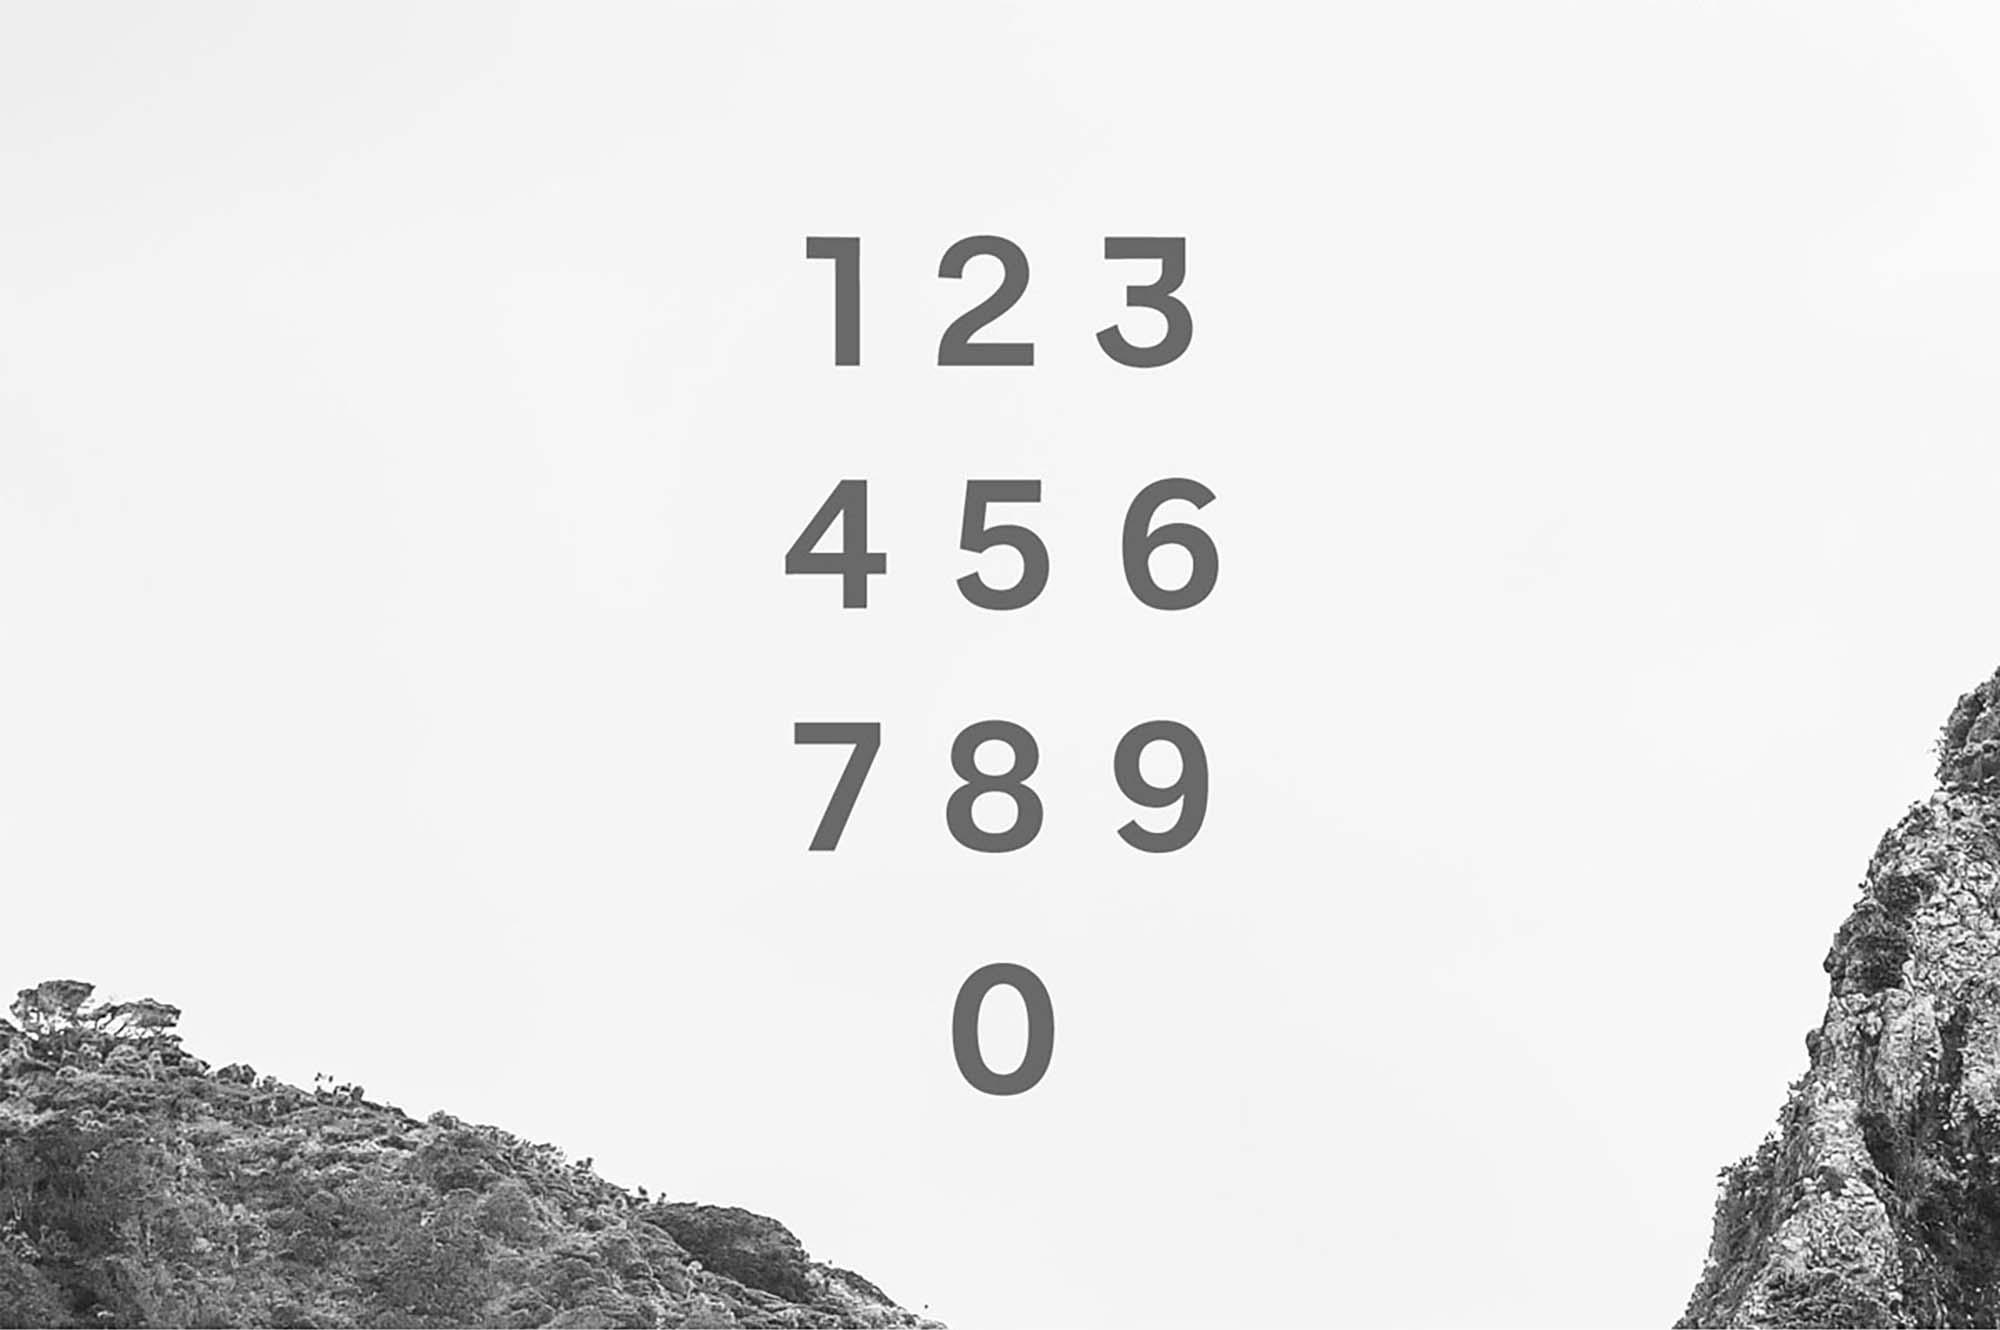 Benett Sans Serif Font Numbers